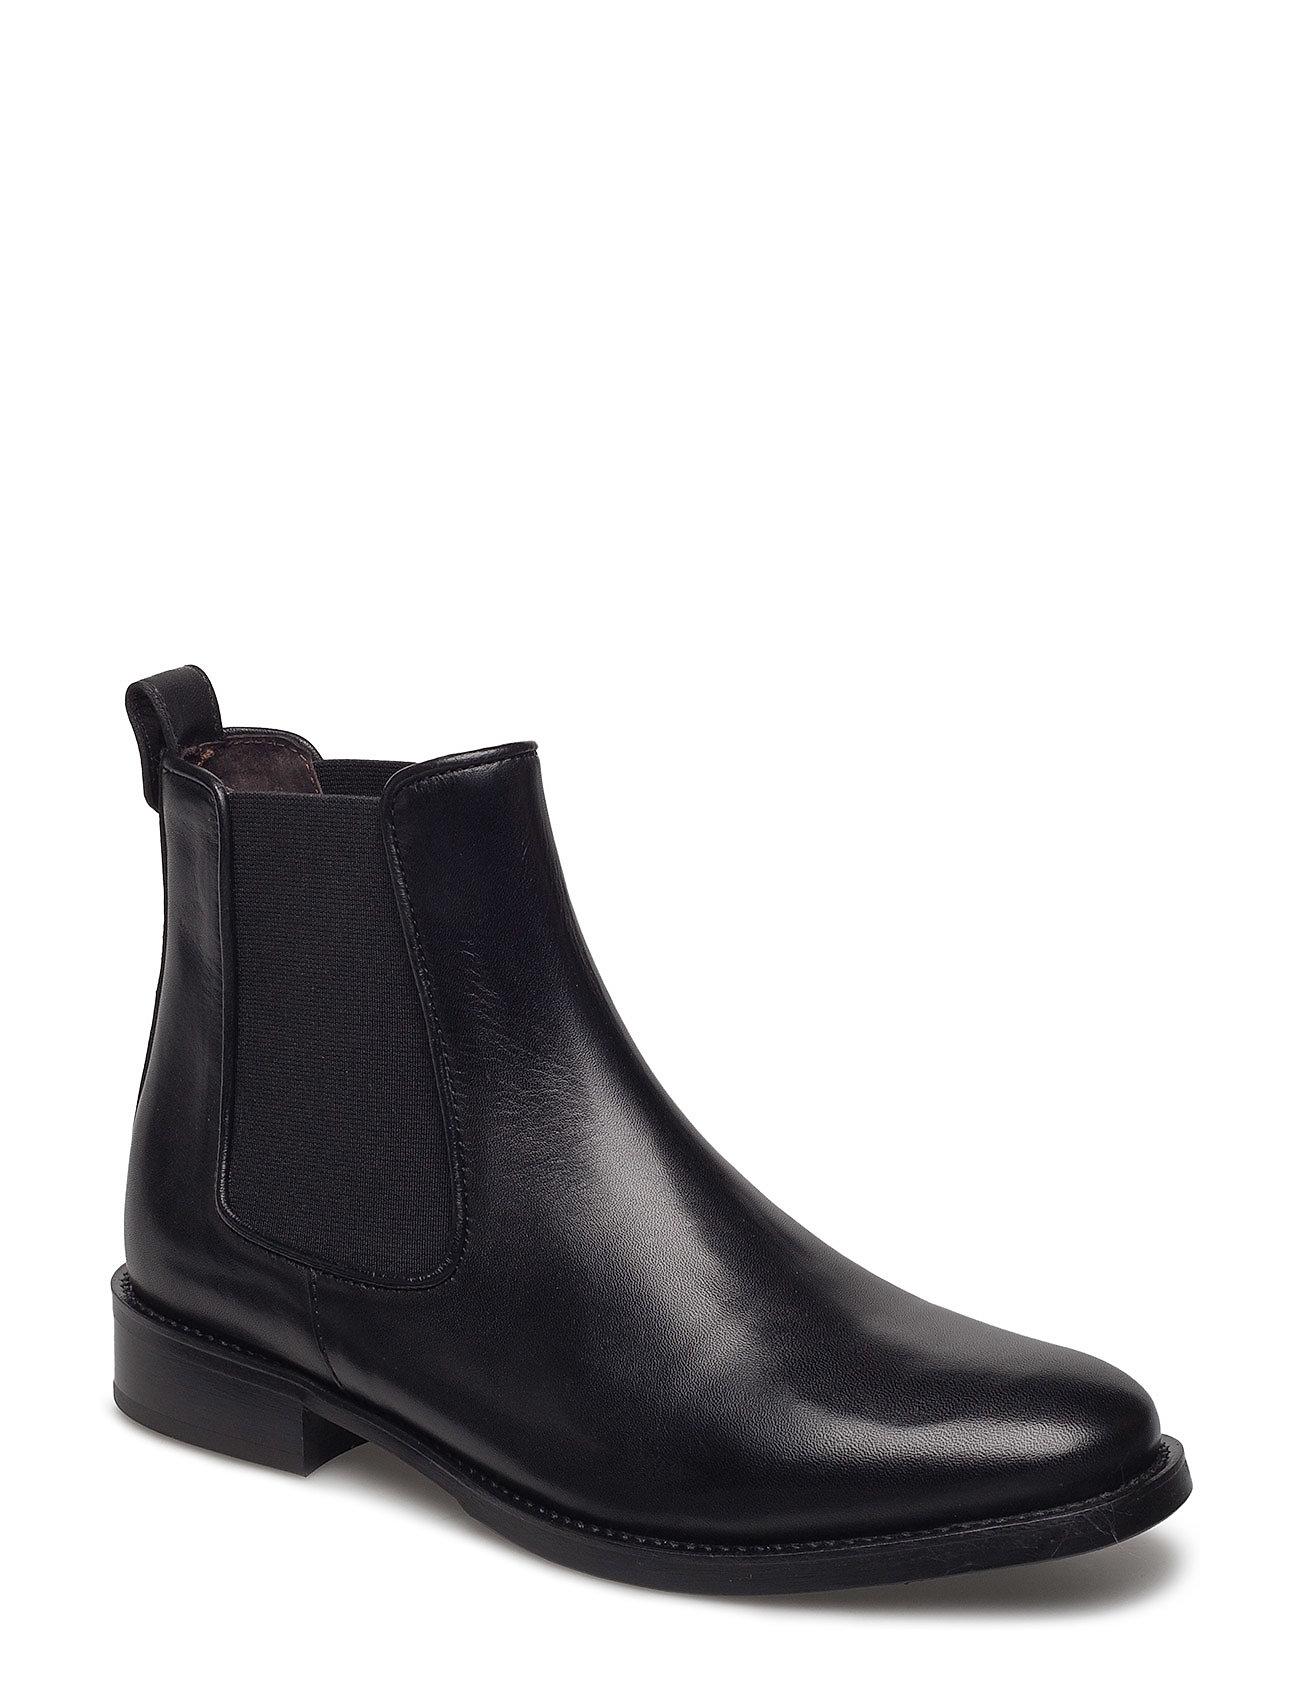 Billi Bi Boots 7913 - BLACK CALF 80 P